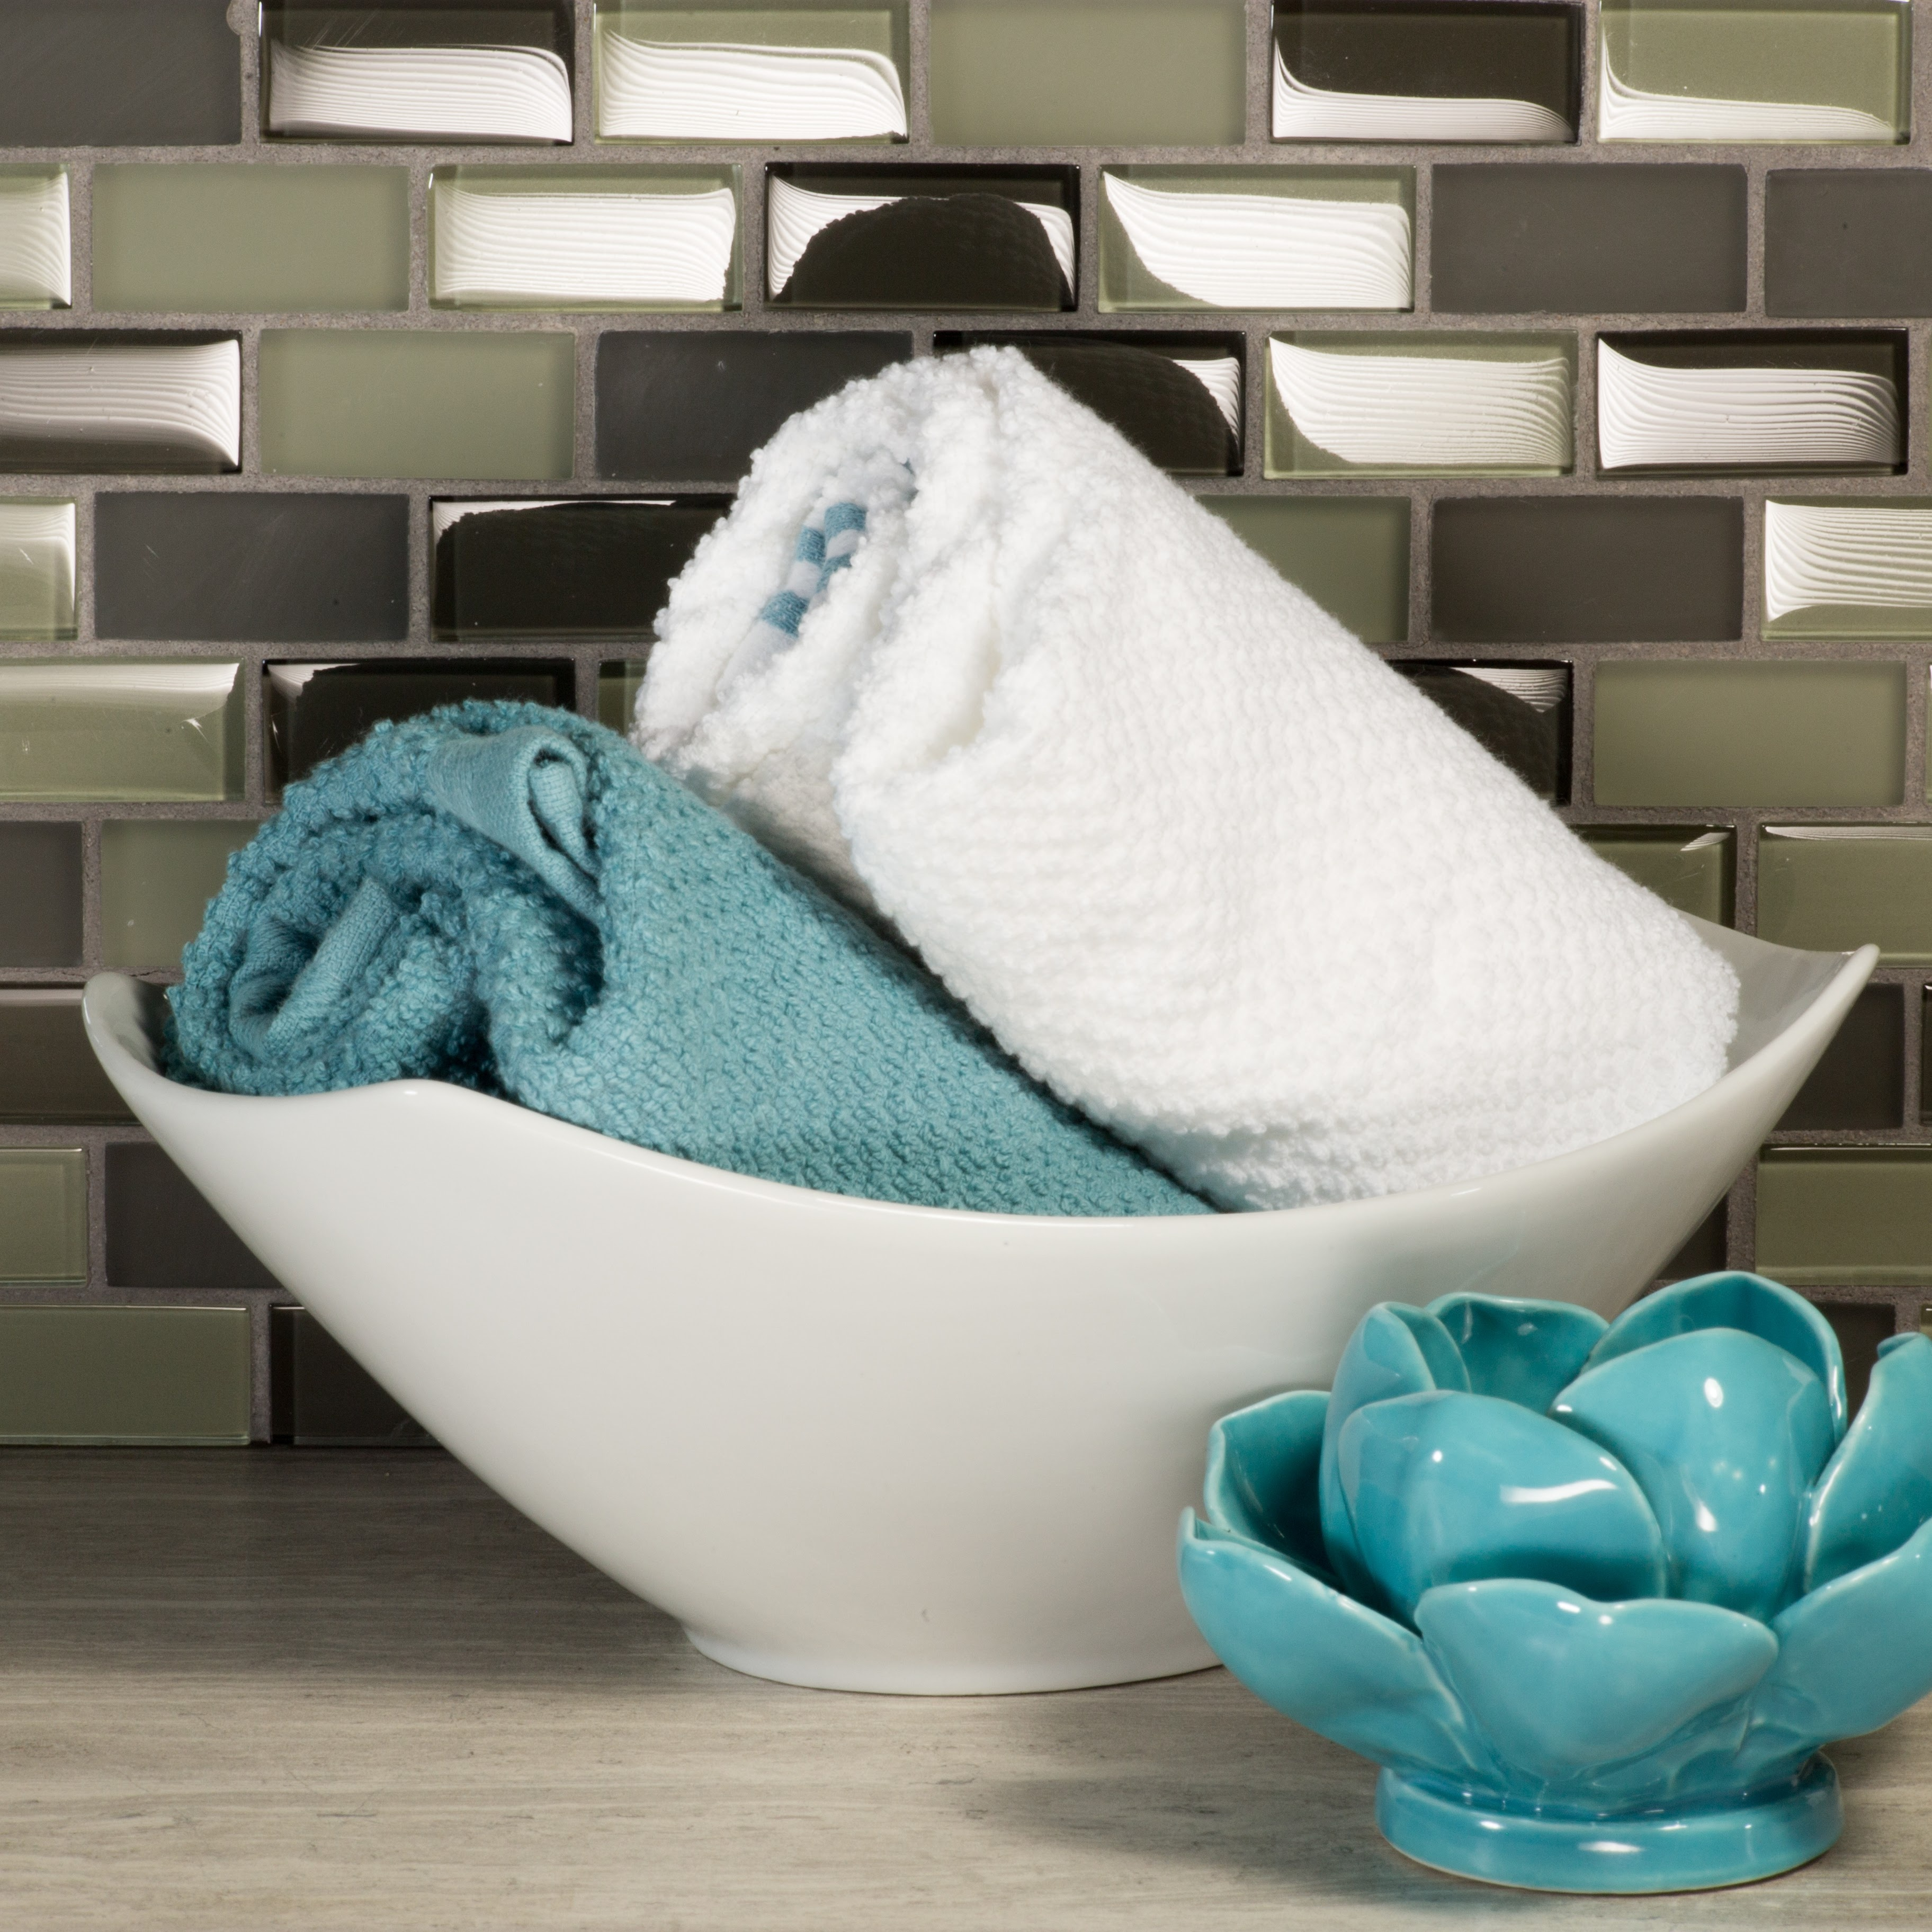 "Free Flow 1"" x 2"" Multi Finish Gray Glass Brick Backsplash Mosaic Wall & Floor Tile"